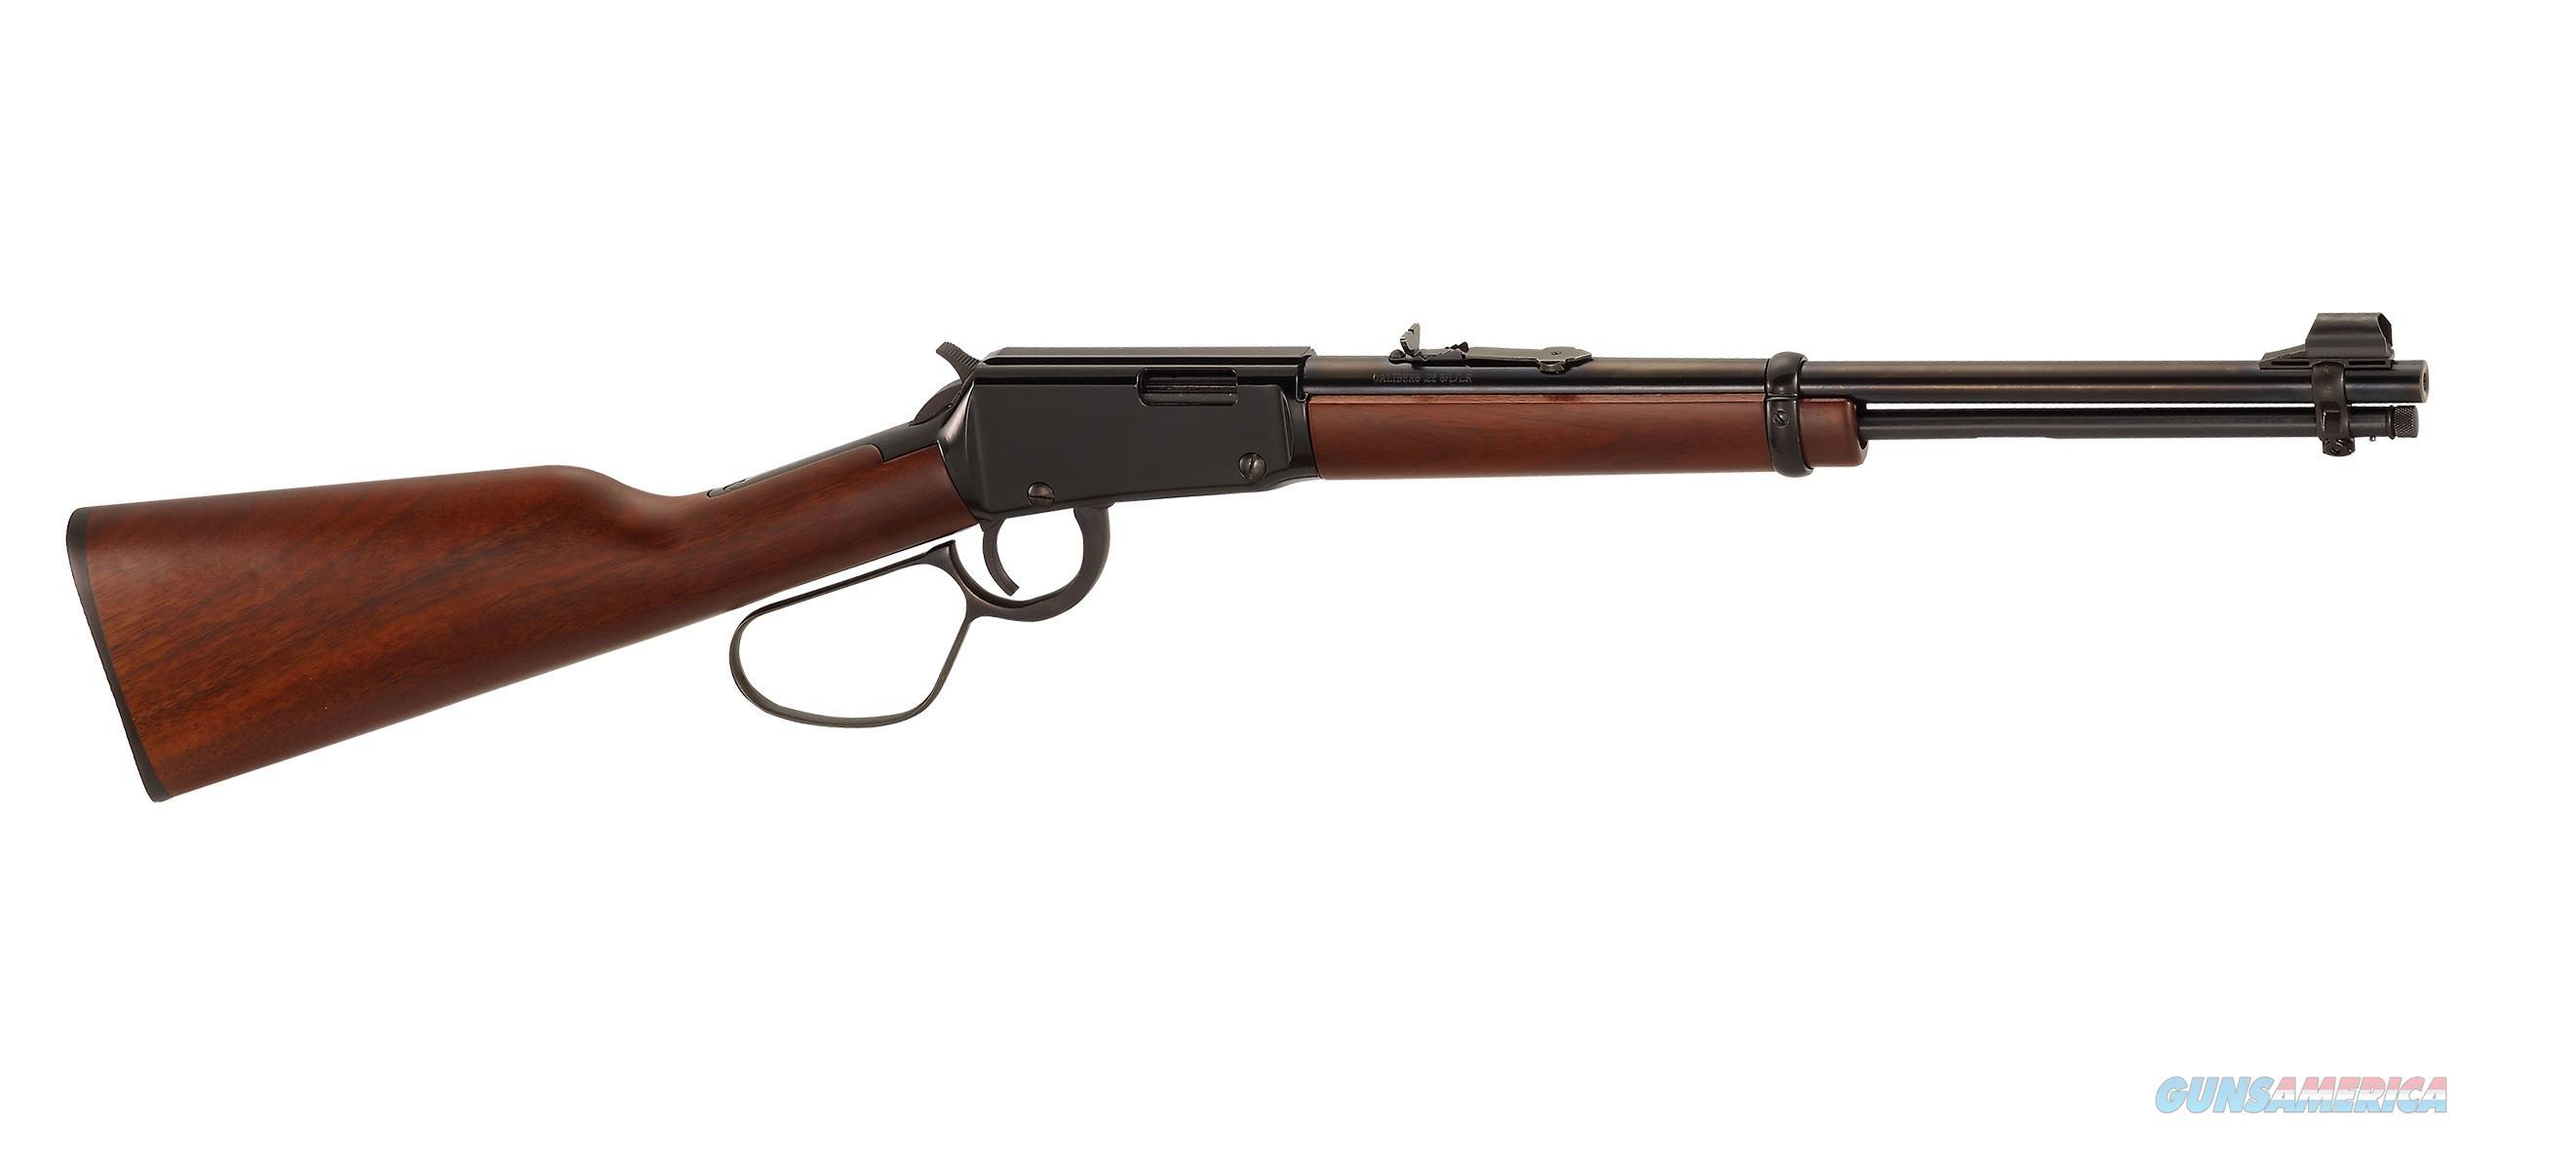 "Henry Lever-Action .22 S/L/LR Carbine Large Loop 16.125"" H001L   Guns > Rifles > Henry Rifles - Replica"